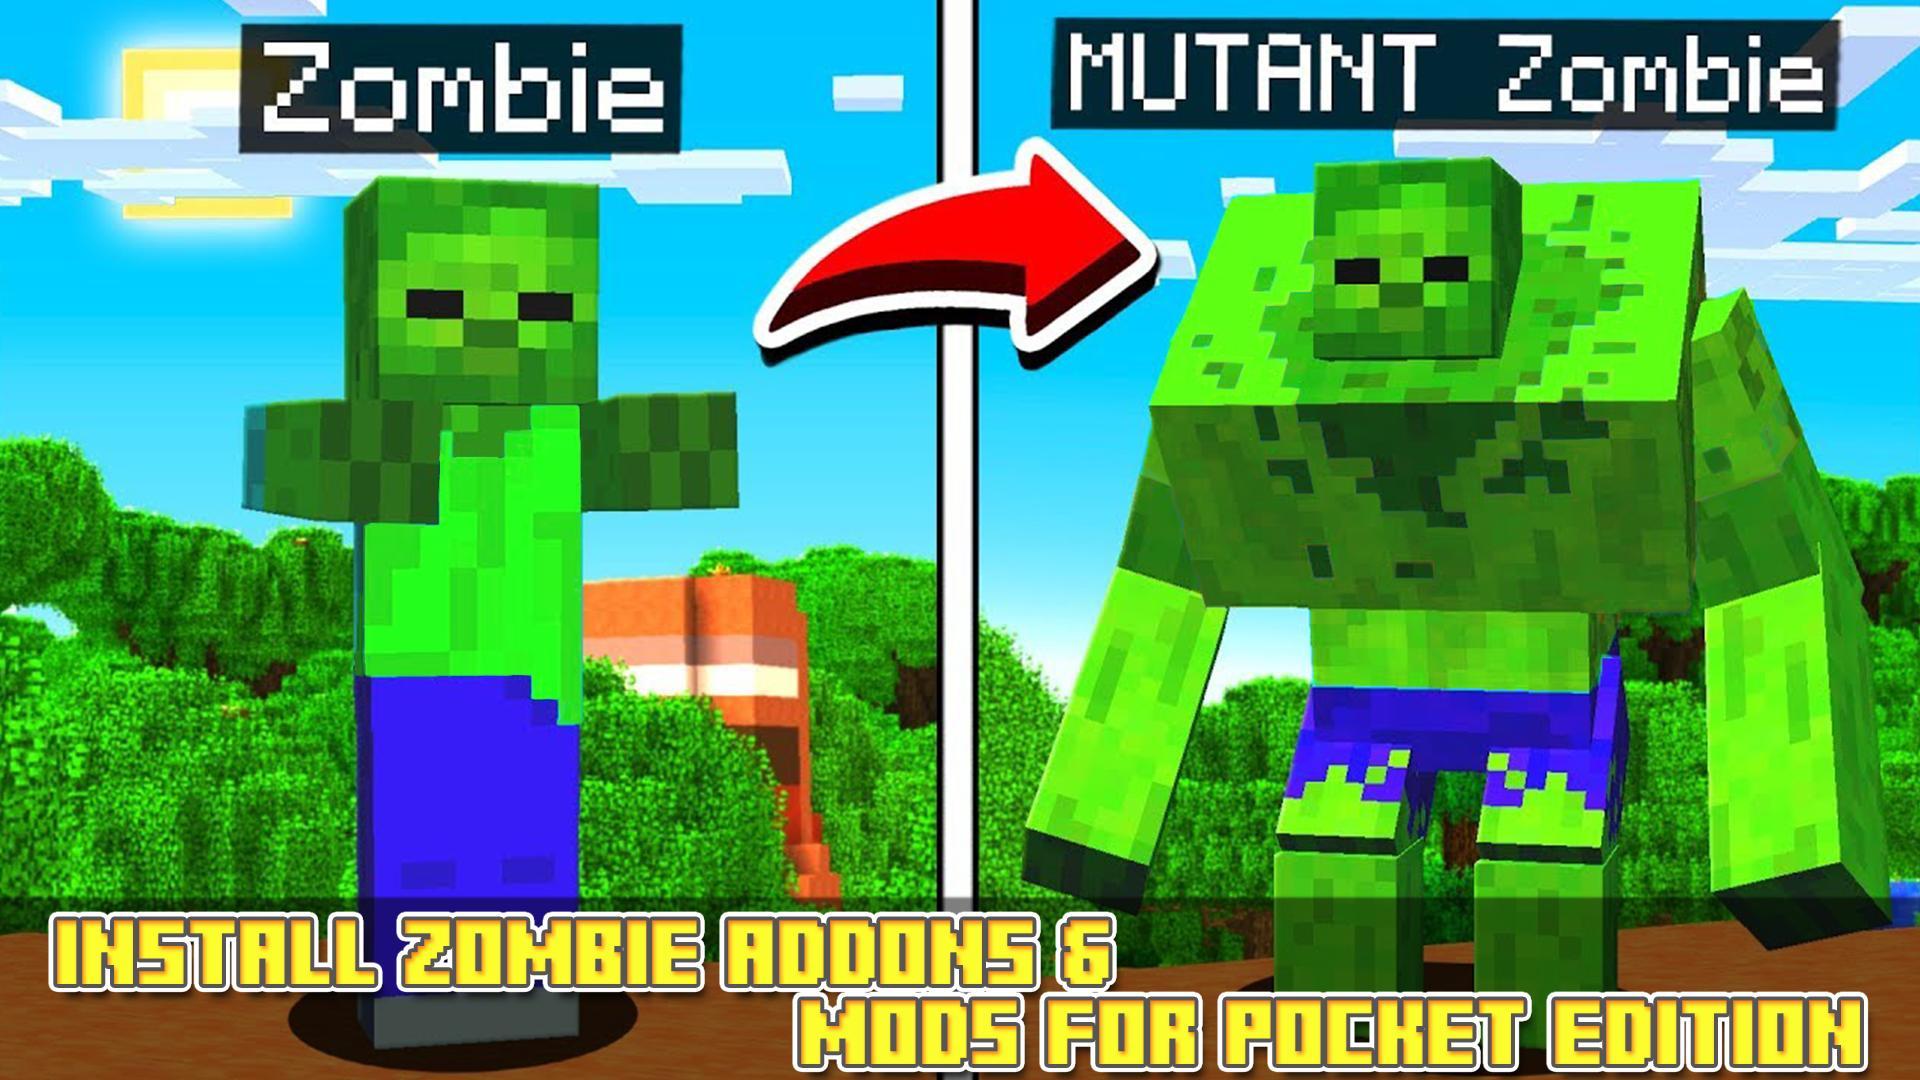 Mutant Mod - Zombie Addons and Mods 1.1 Screenshot 3